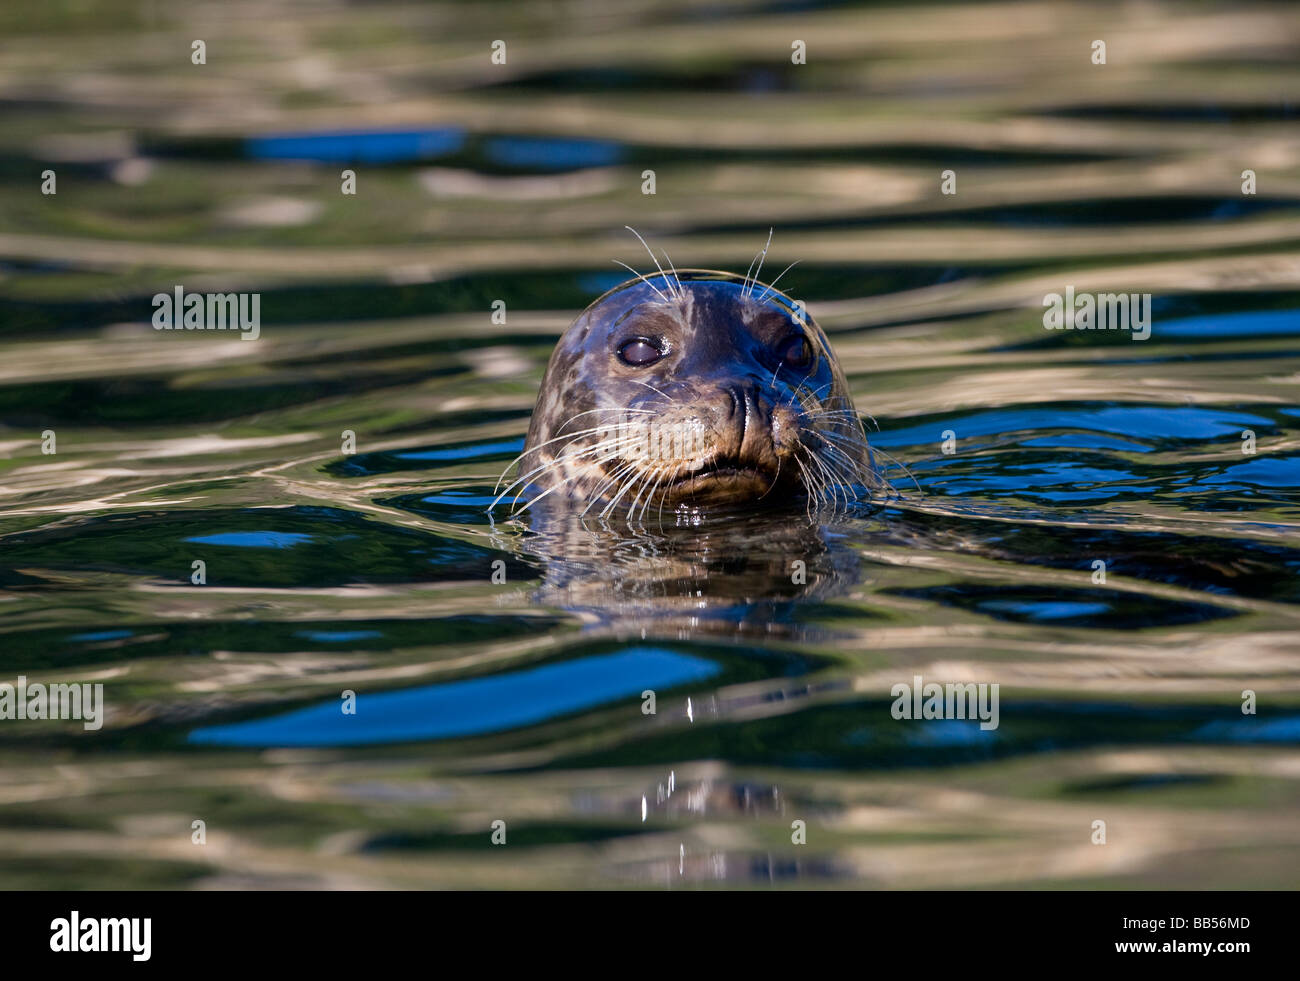 Harbor seal (Phoca vitulina) in Monterey Bay, California. - Stock Image